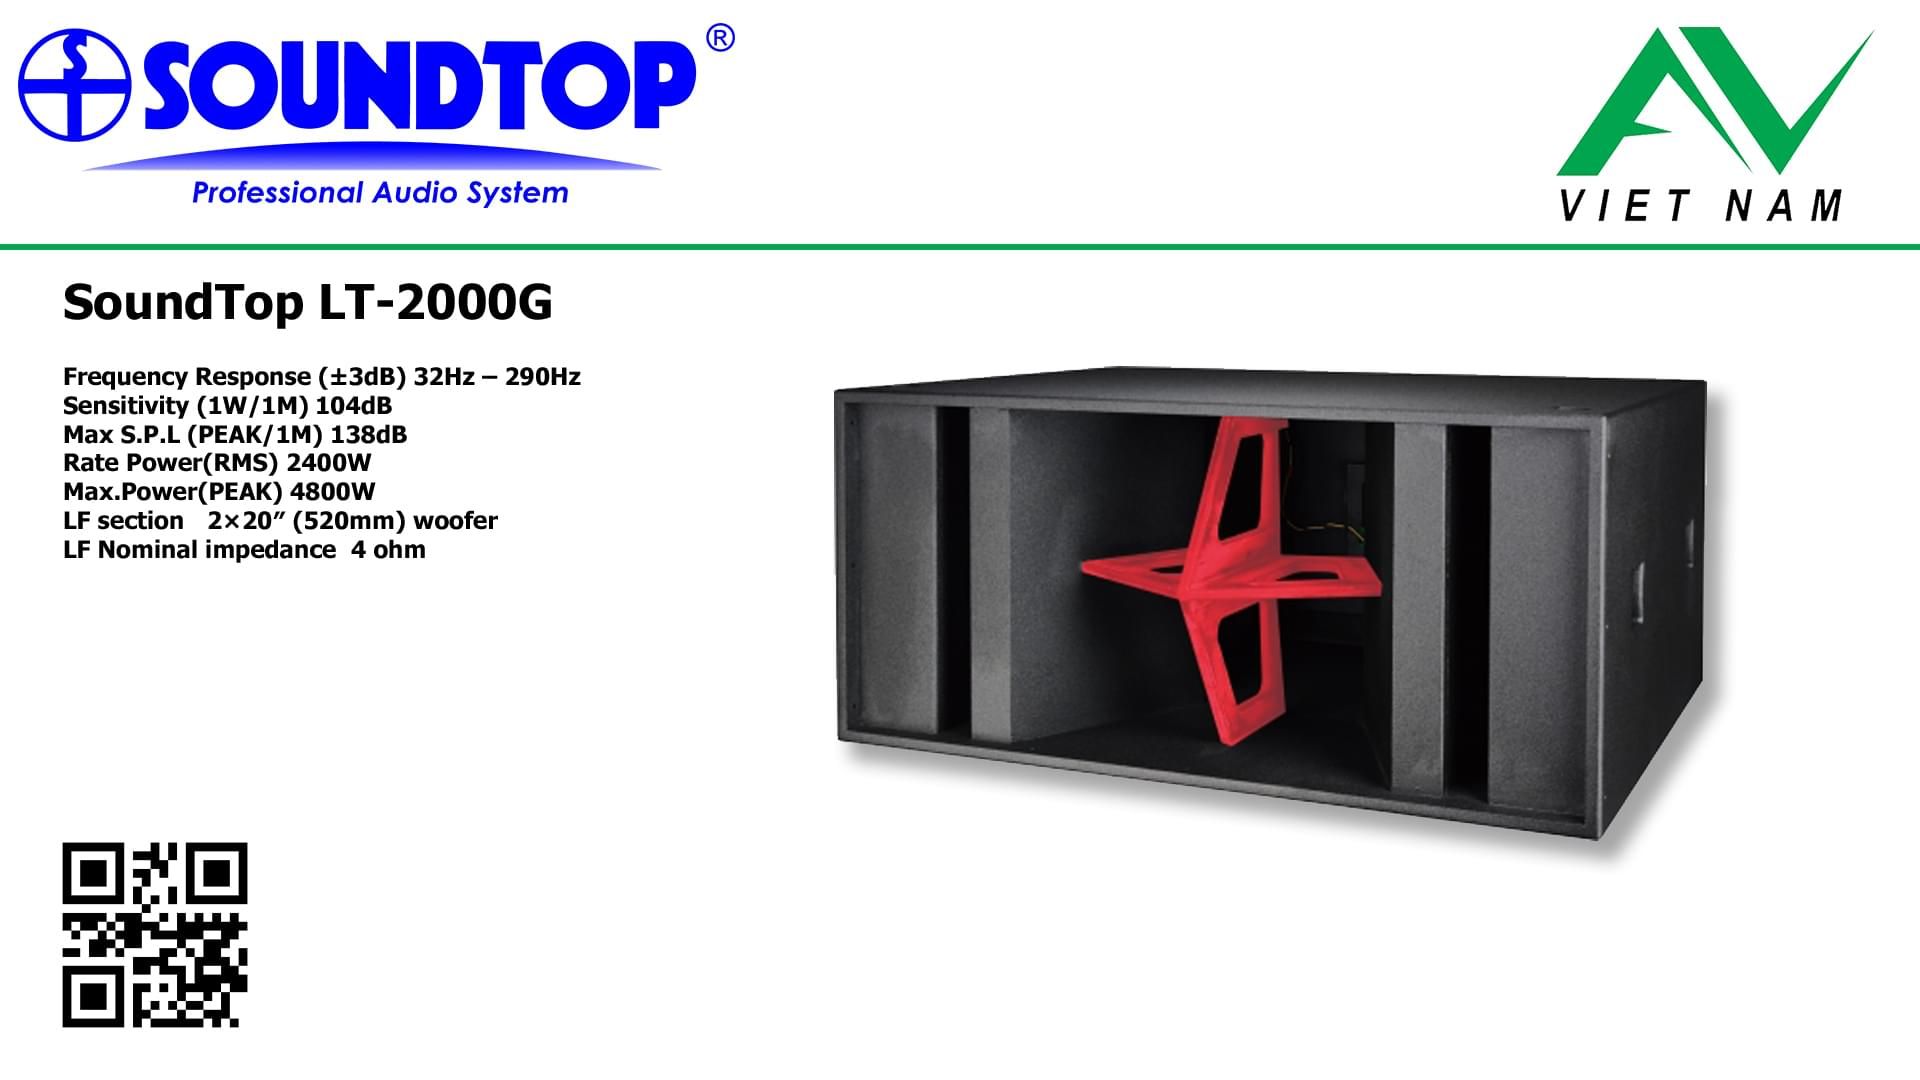 SoundTop LT-2000G